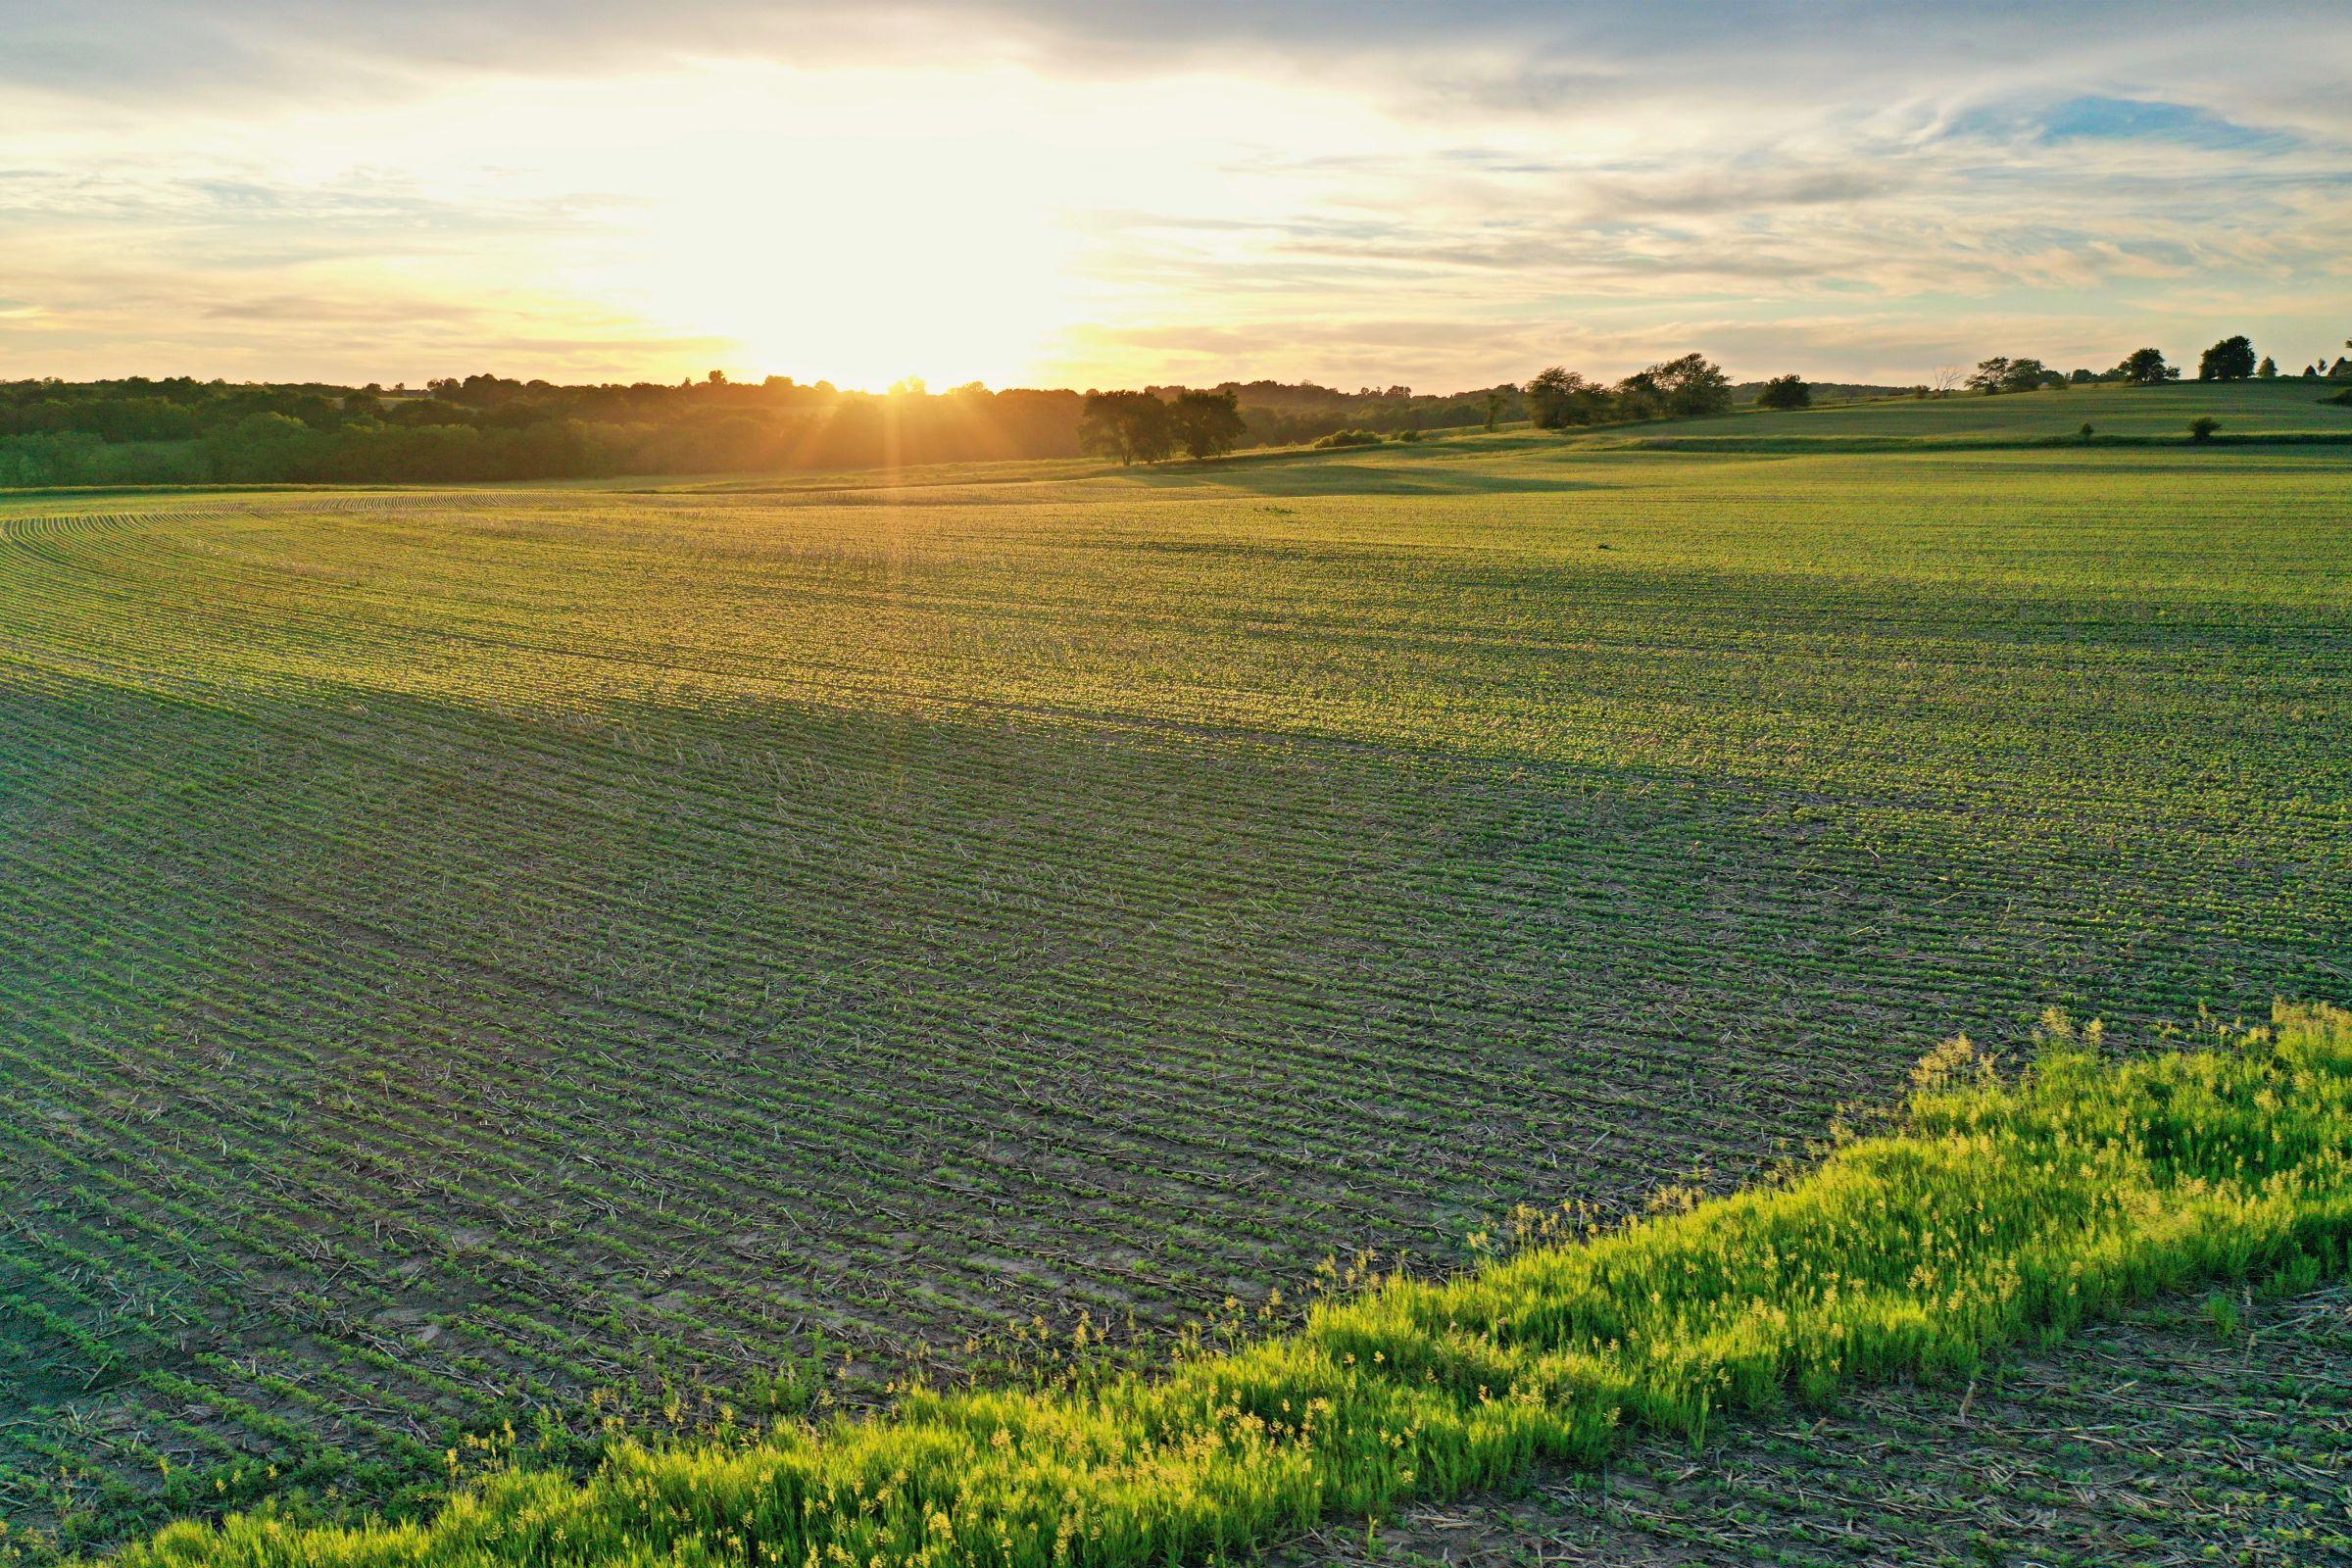 land-warren-county-iowa-20-acres-listing-number-15426-2-2021-03-24-190159.JPG